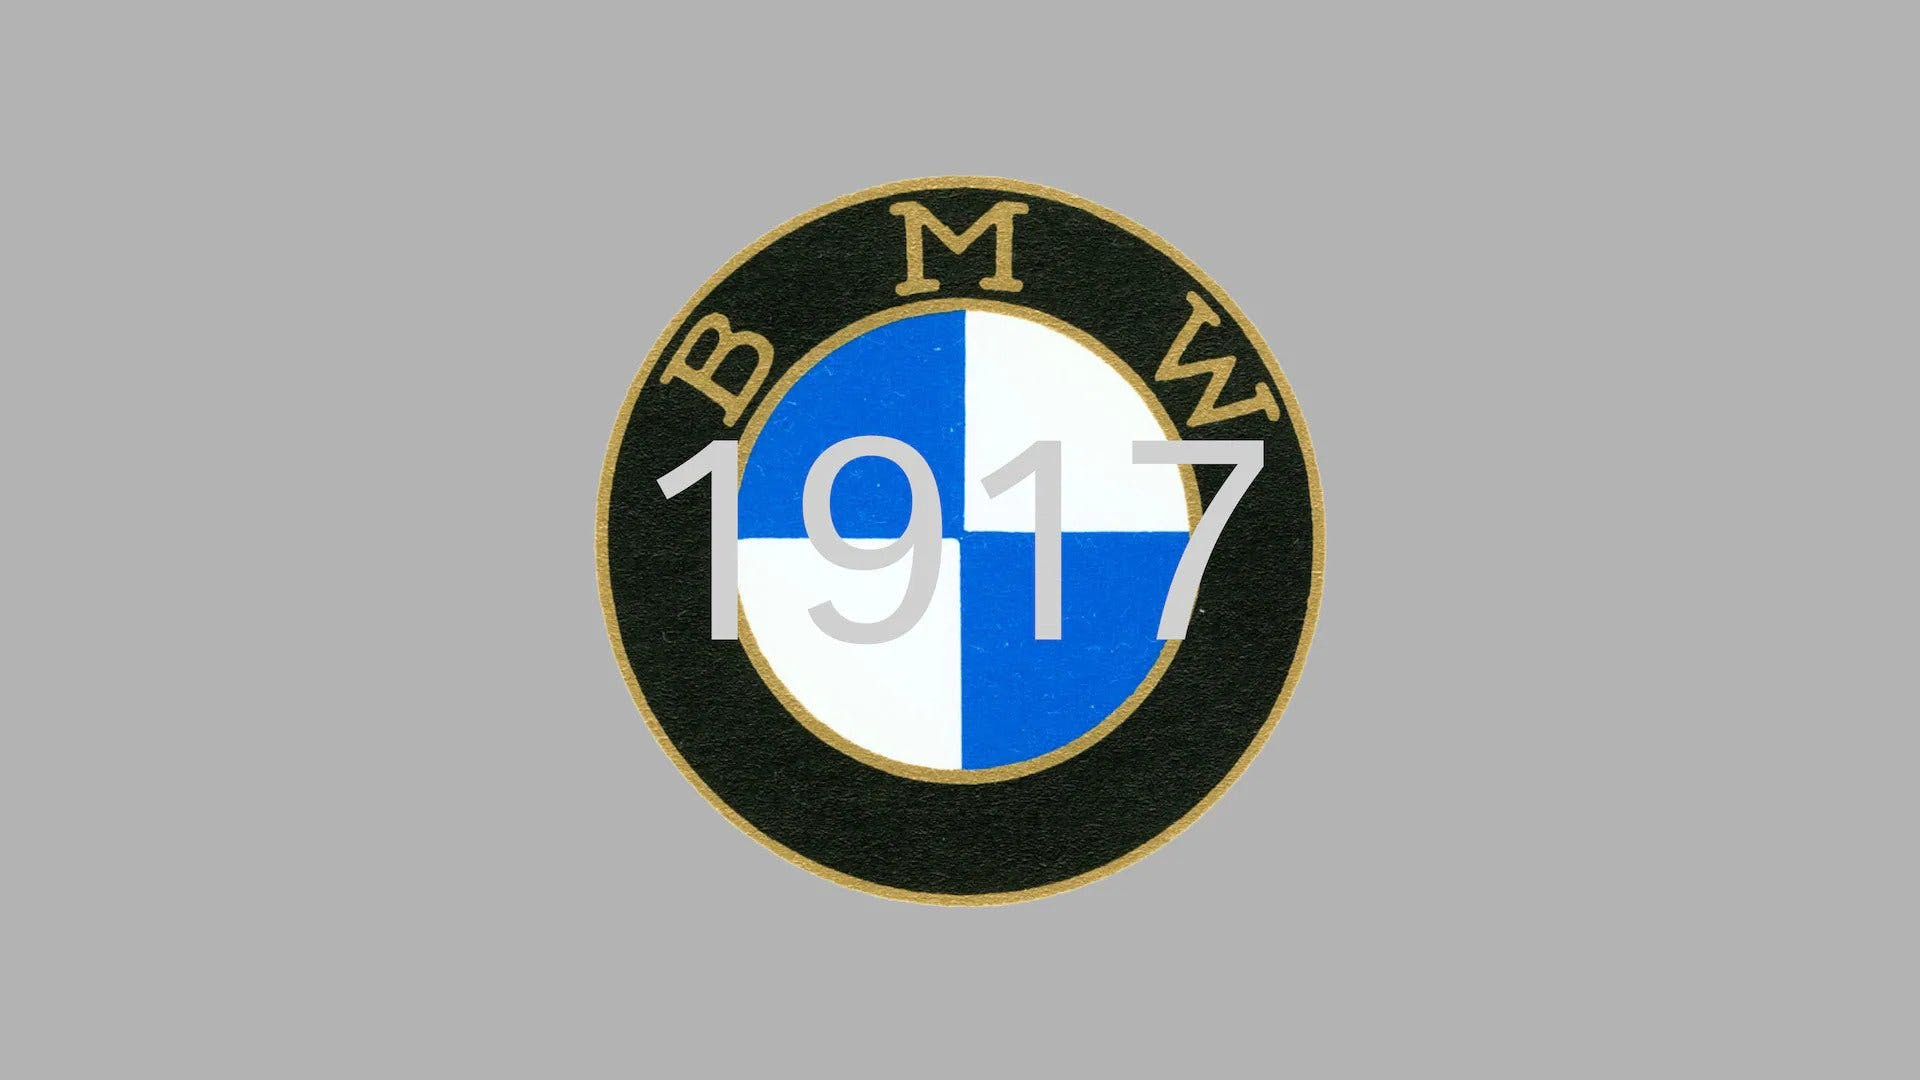 BMW 1917 logo